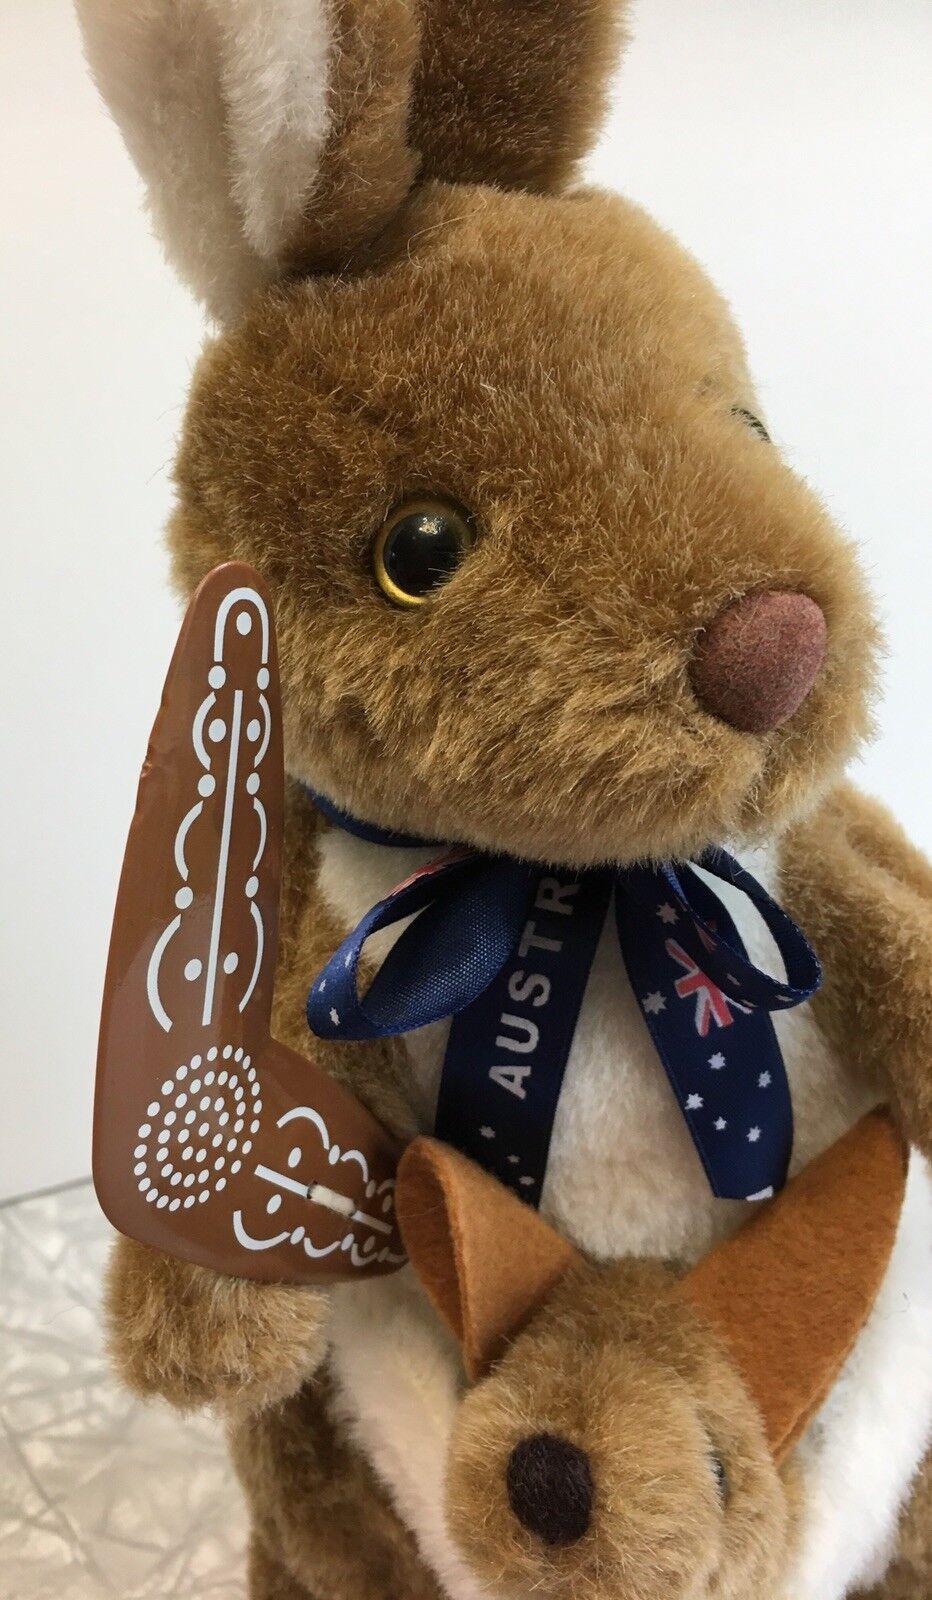 Happy Memories From Australia Plush Kangaroo & & & Baby Joey Boomerang d40eaa